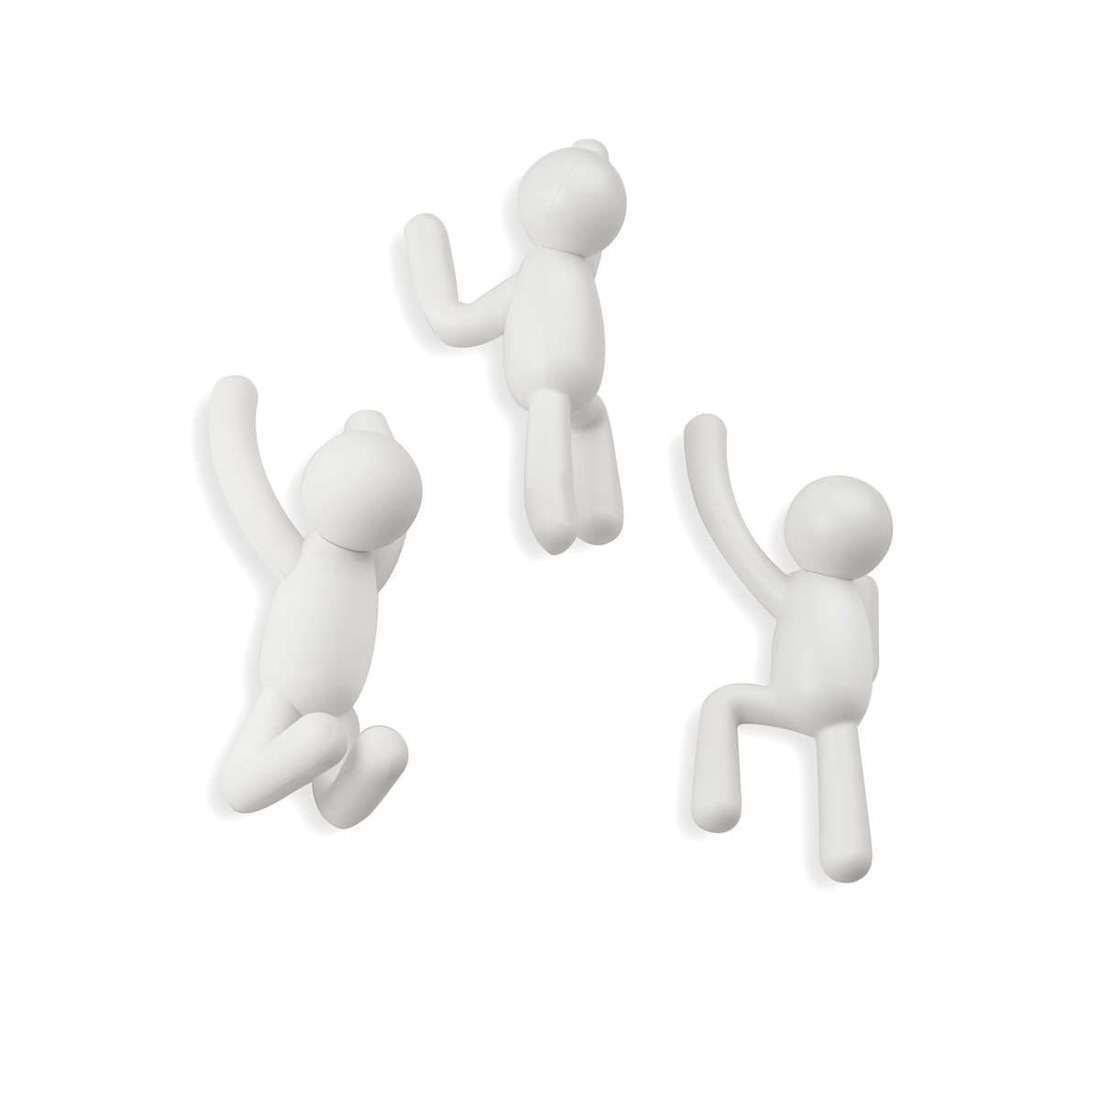 Umbra Buddy Hooks White Set of 3